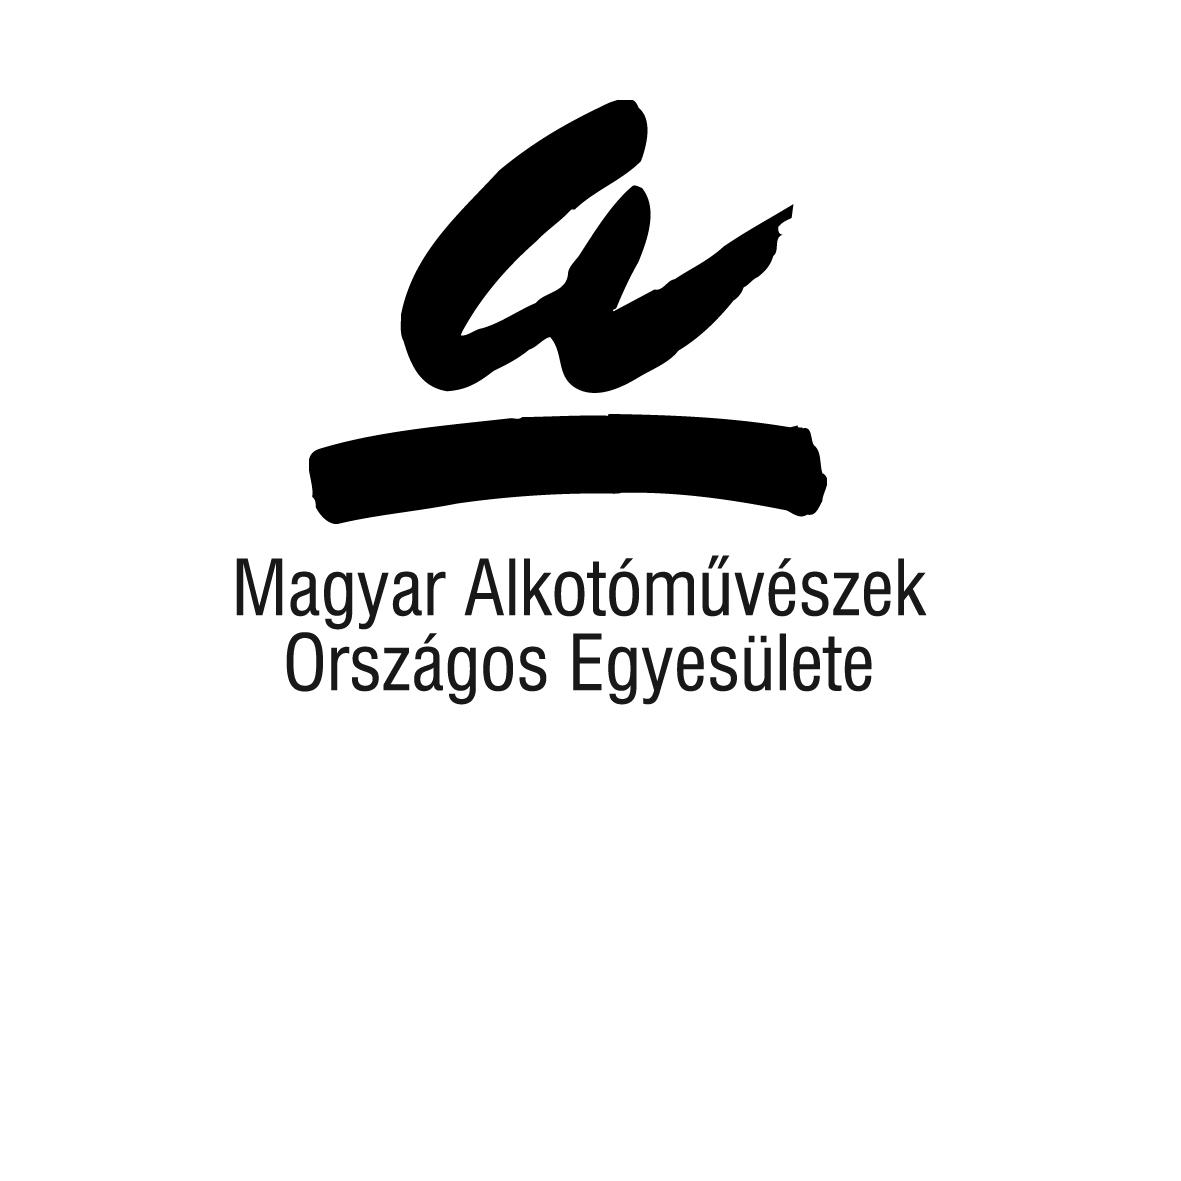 maoe feliratos logo